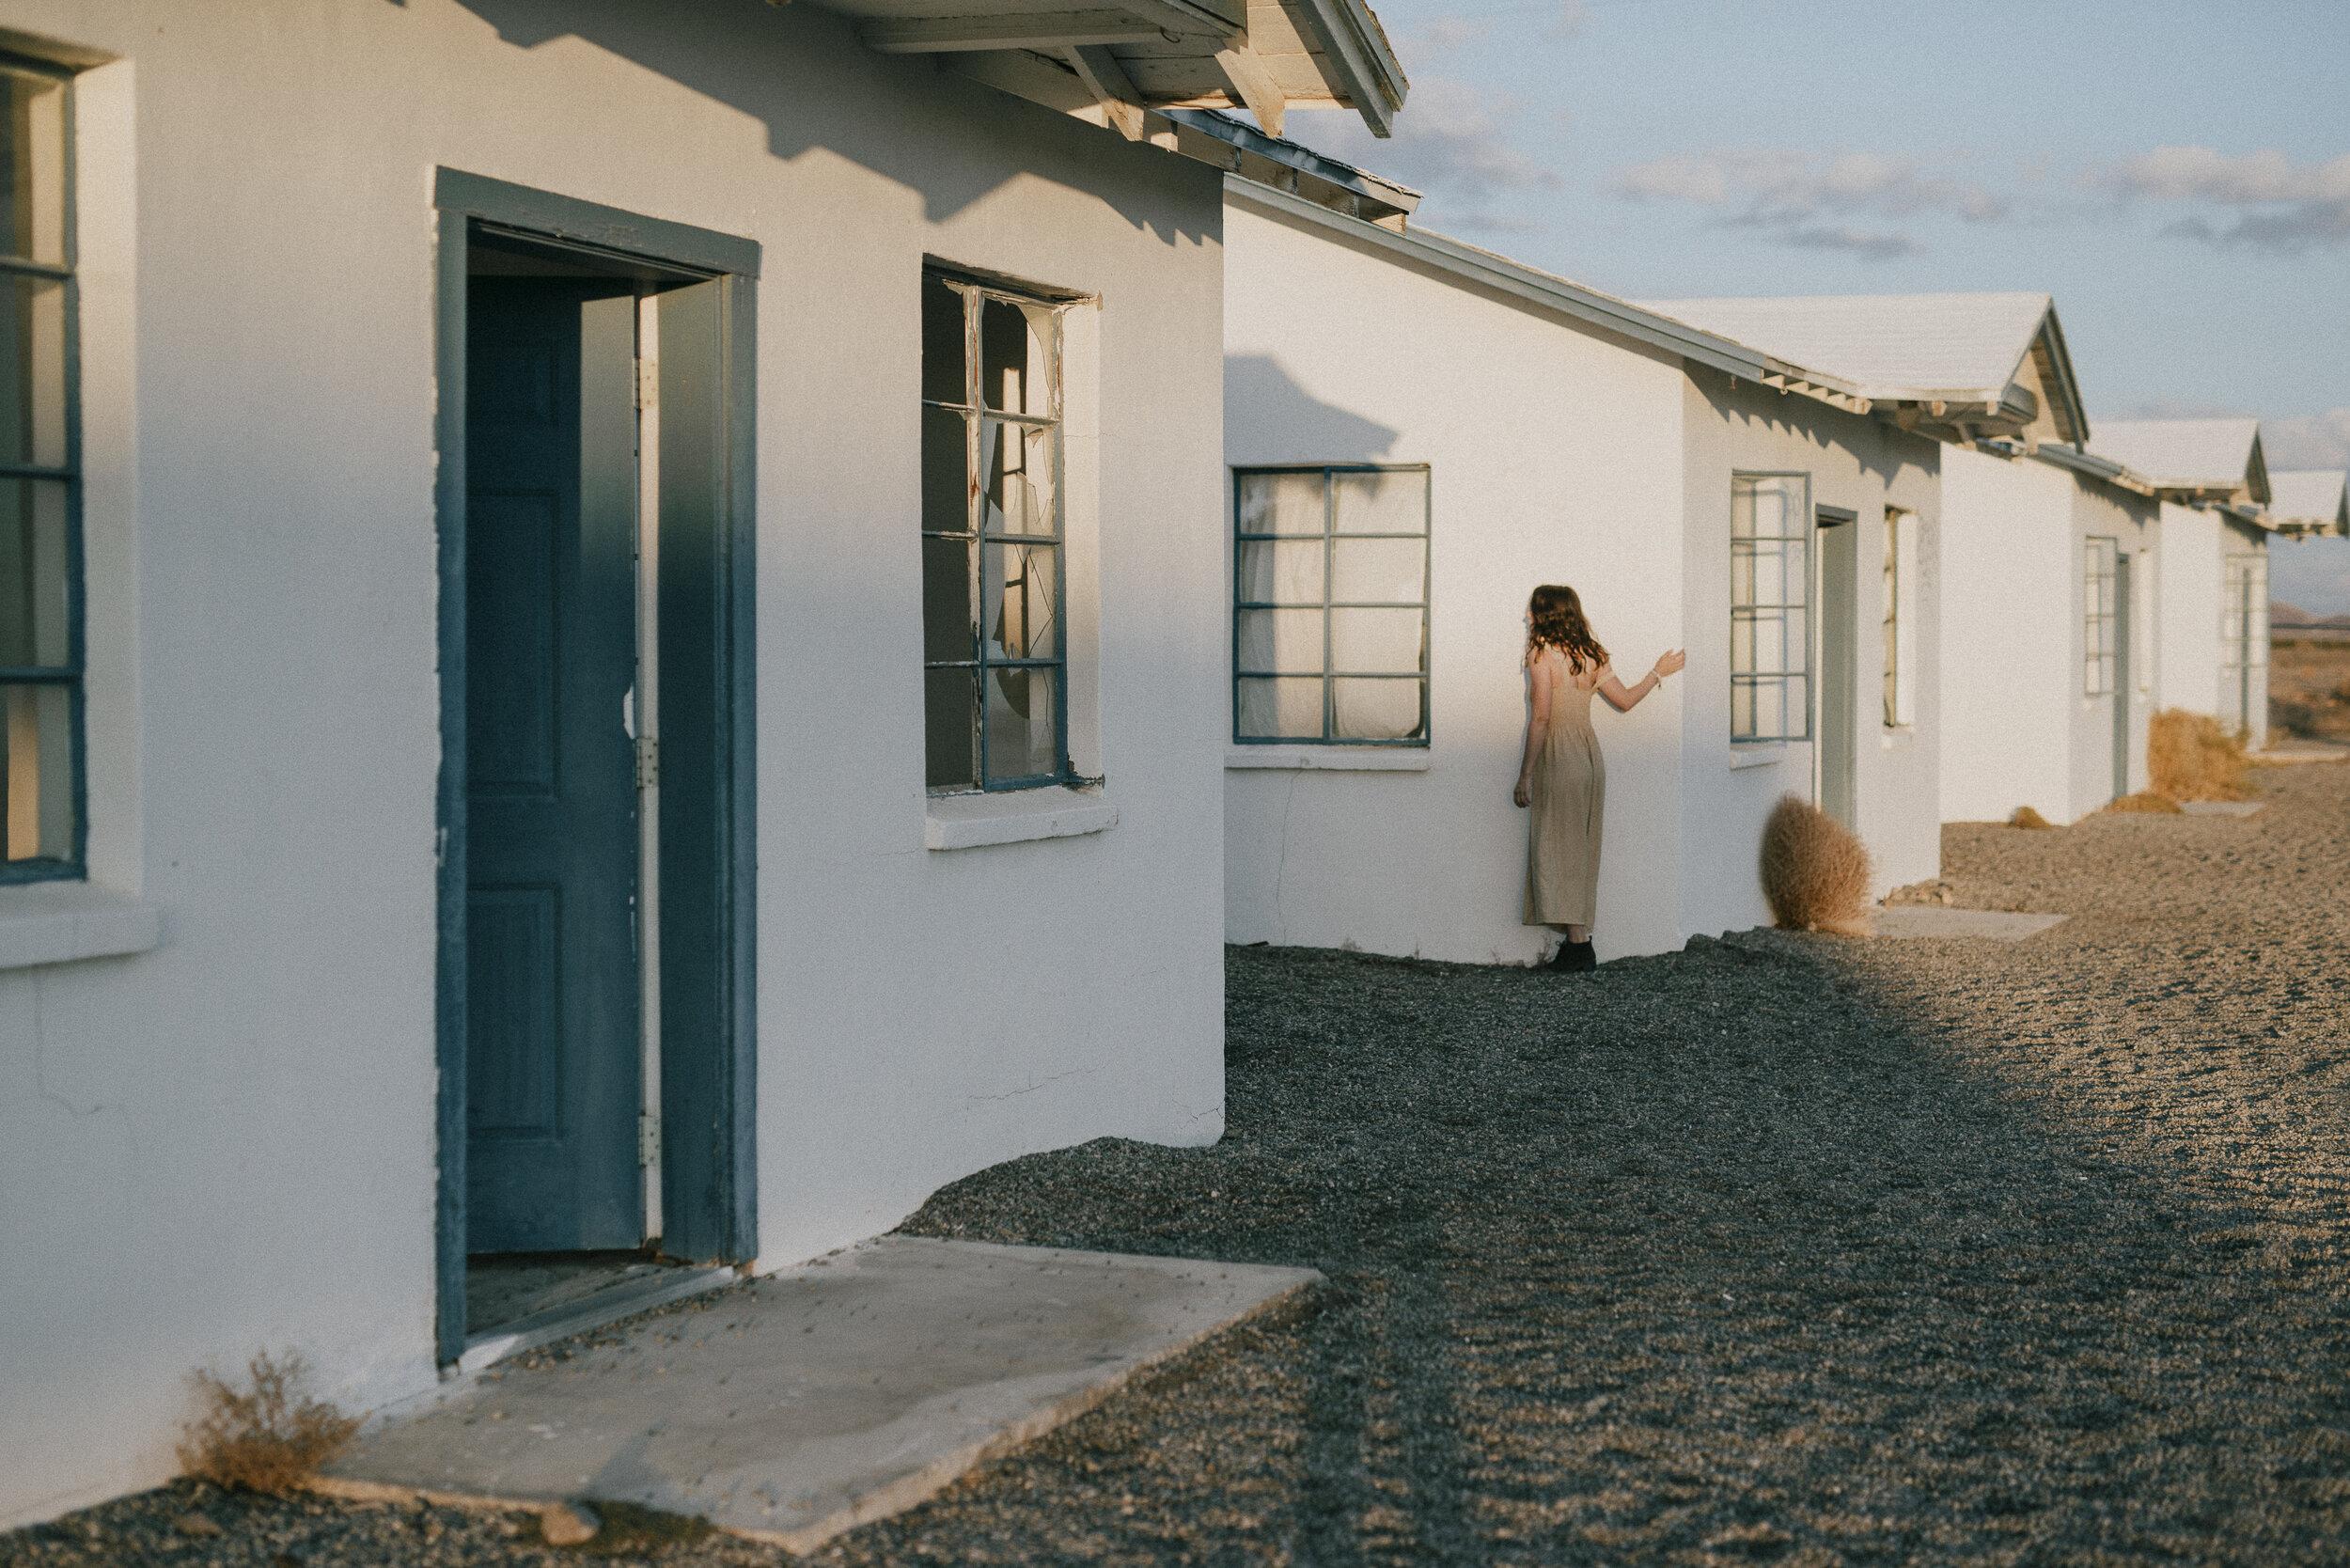 karmen-meyer-photography-mojave--collection-roys-motel-be-you-not-them.JPG